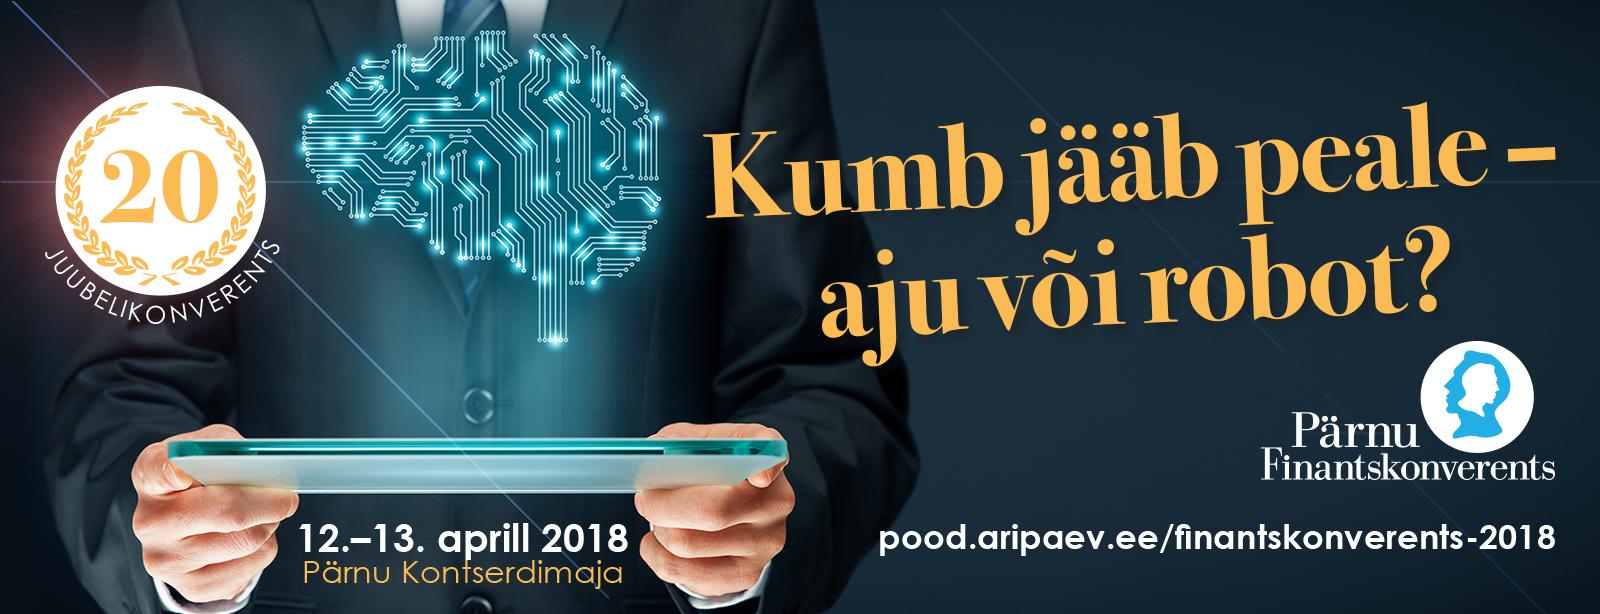 Finantskonverents